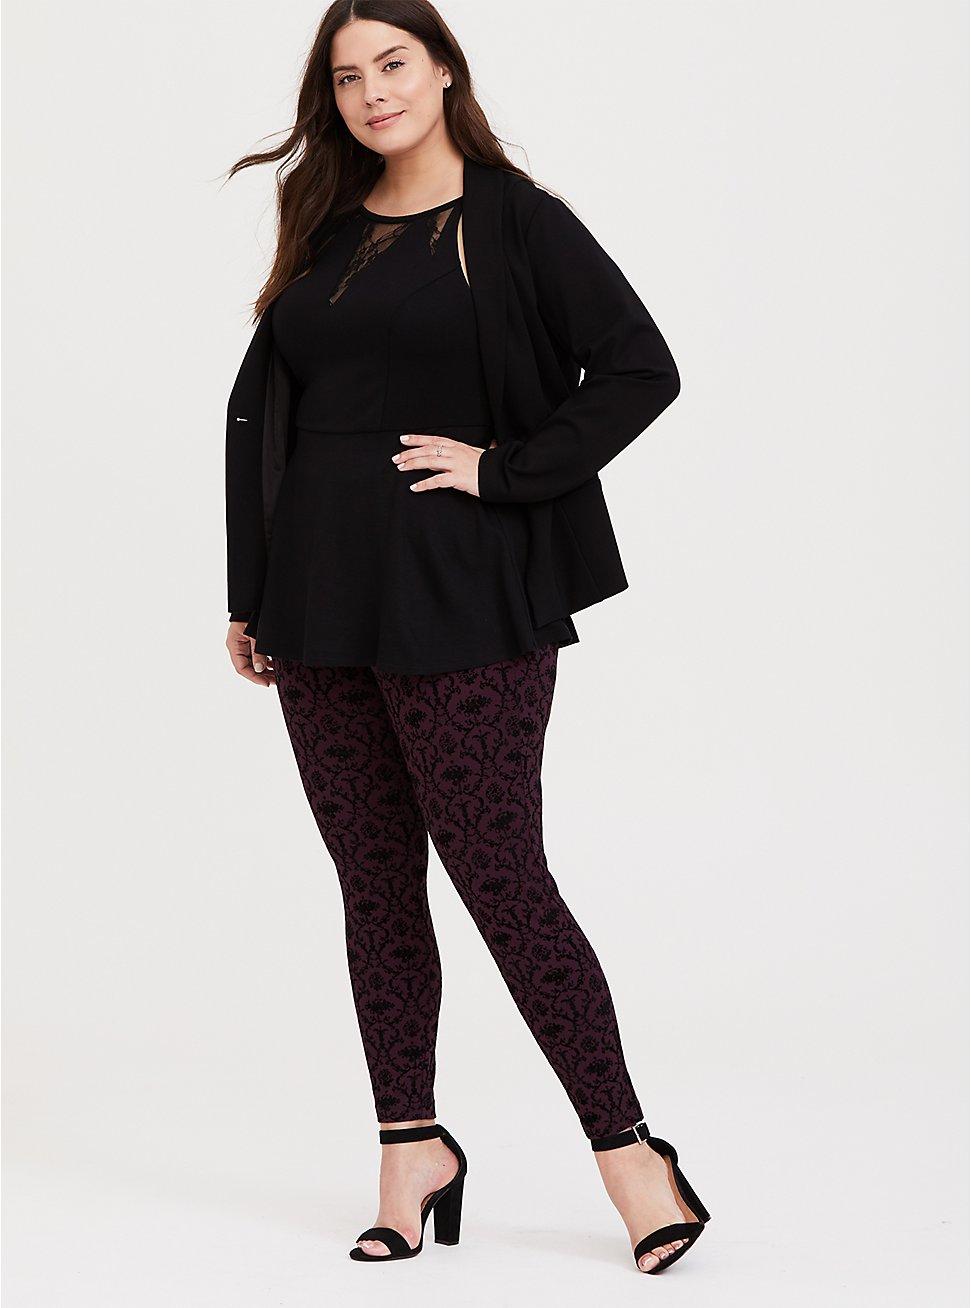 Studio Ponte Slim Fix Pixie Pant - Burgundy Purple & Black Flocked Print, HIGHLAND THISTLE, hi-res